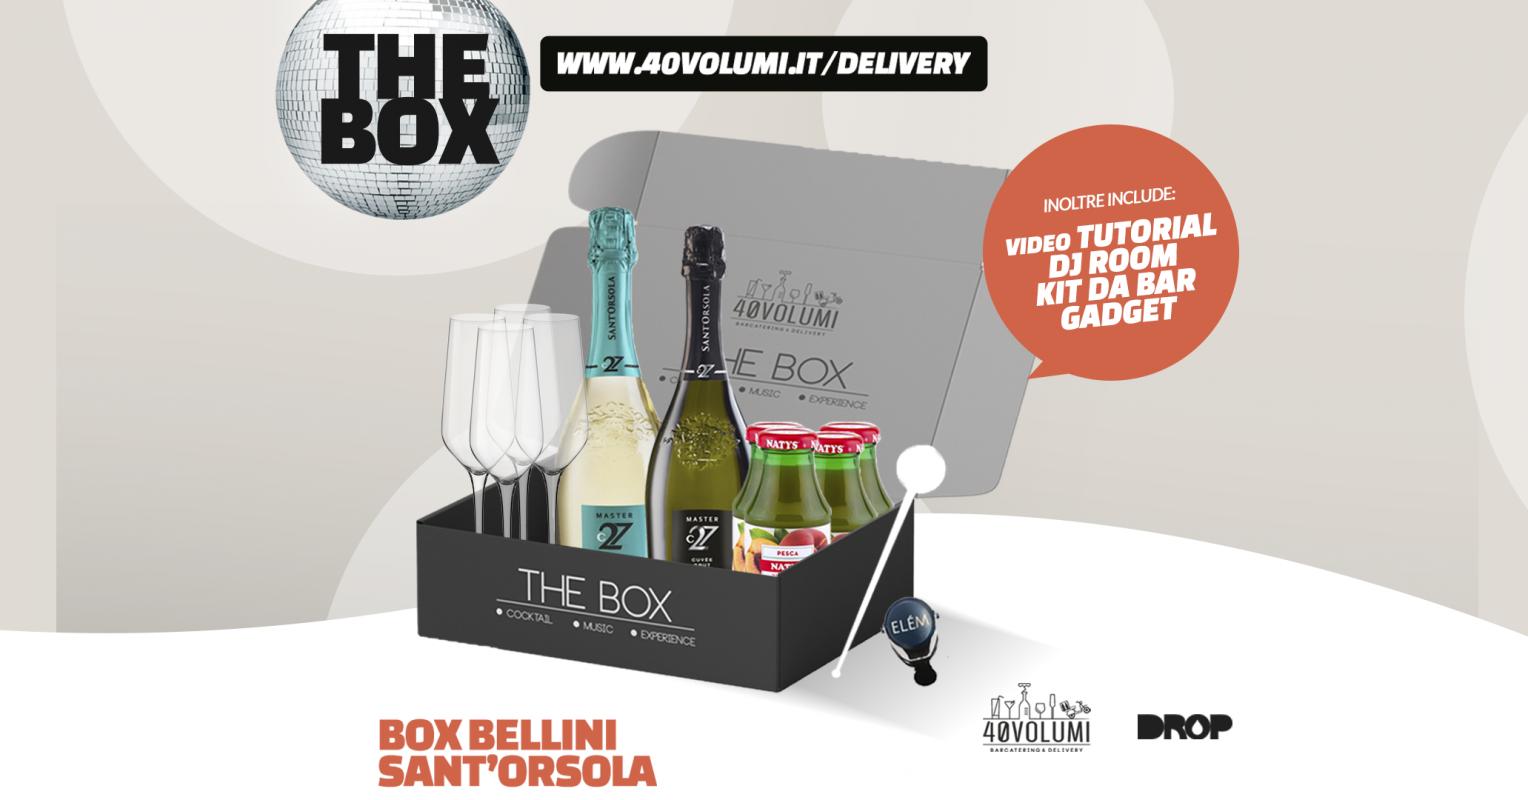 box bellini per 40 volumi